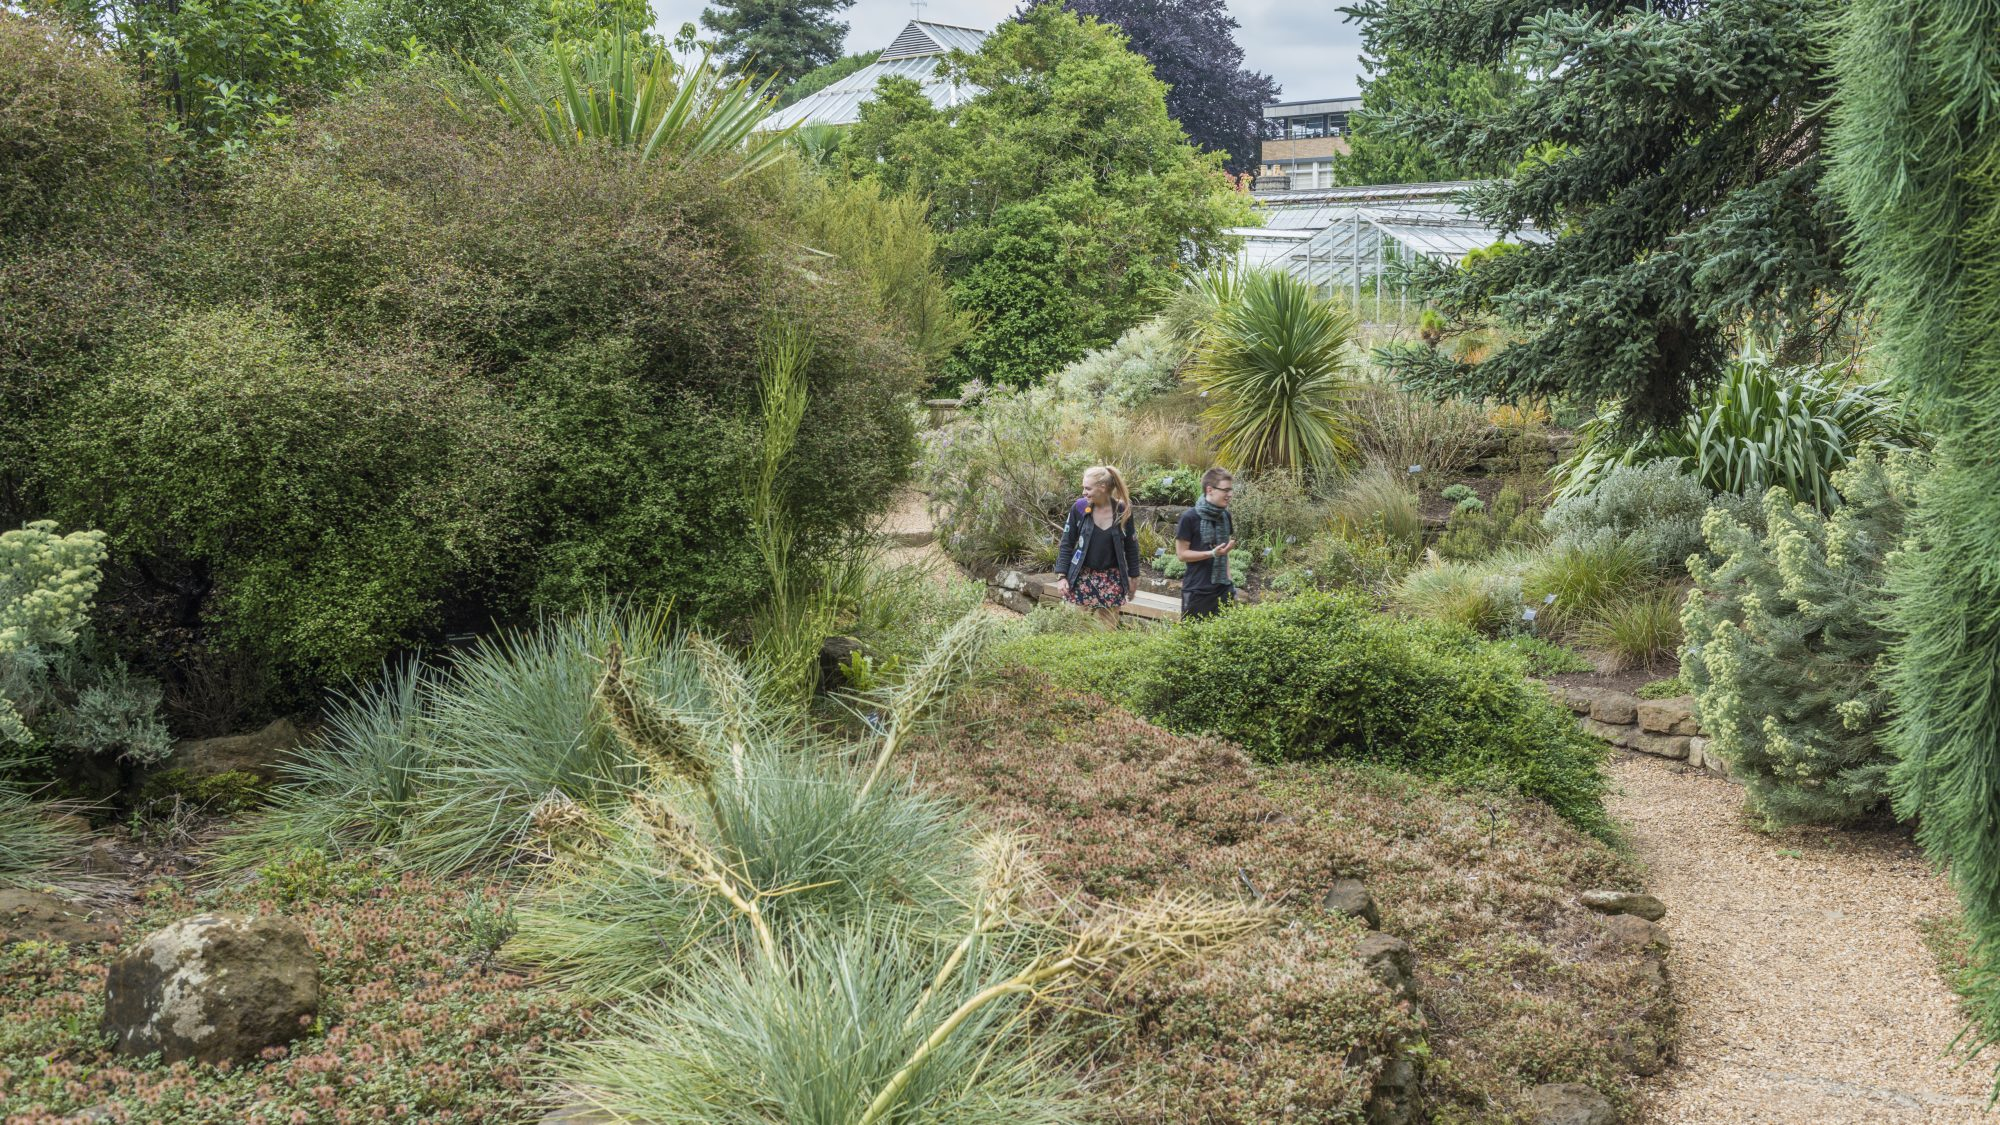 Visitors walking through the Terrace Garden (New Zealand Flora).